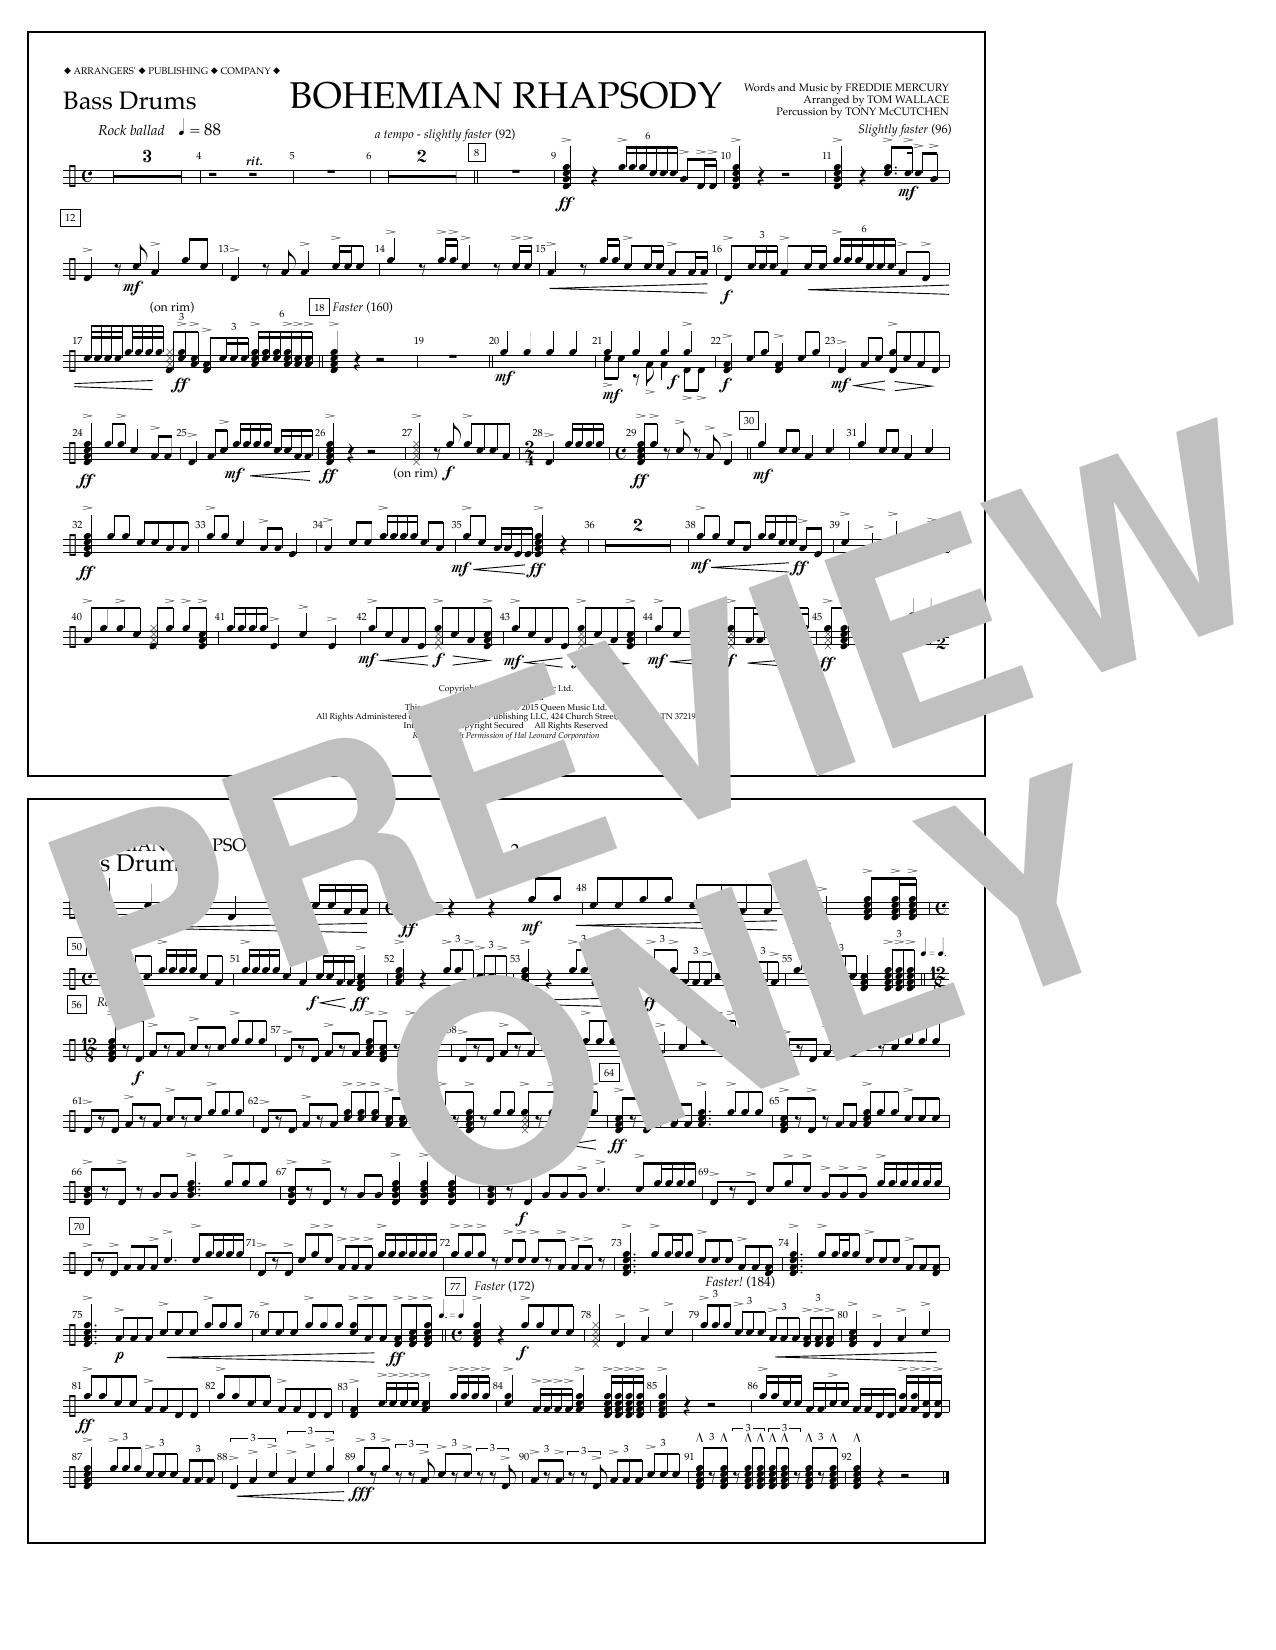 Bohemian Rhapsody - Bass Drums Sheet Music